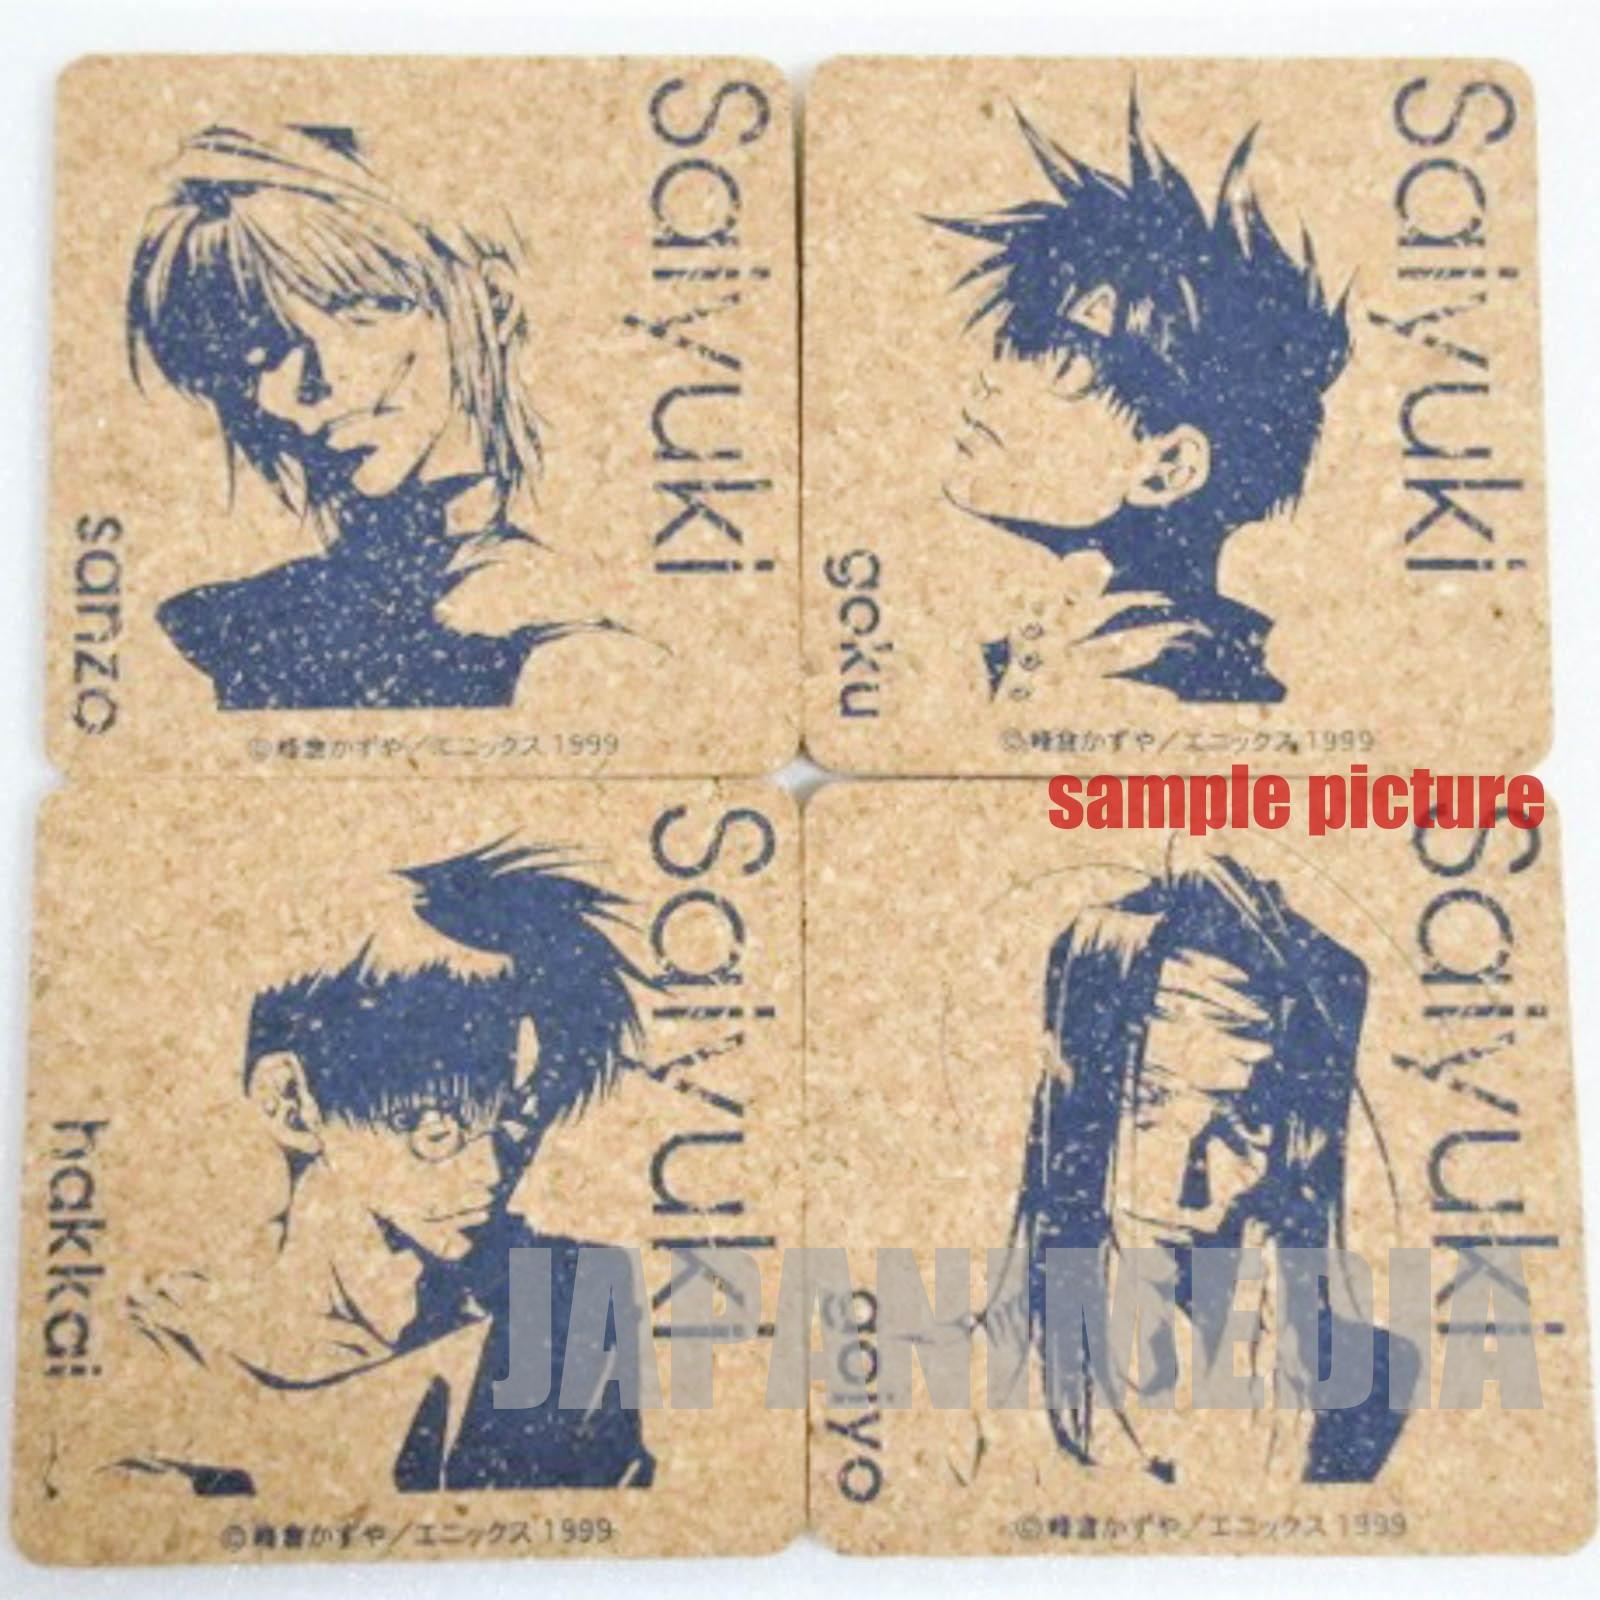 SAIYUKI Cork Coasters 4pc Set [Sanzo / Goku / Gojyo / Hakkai] Kazuya Minekura JAPAN ANIME